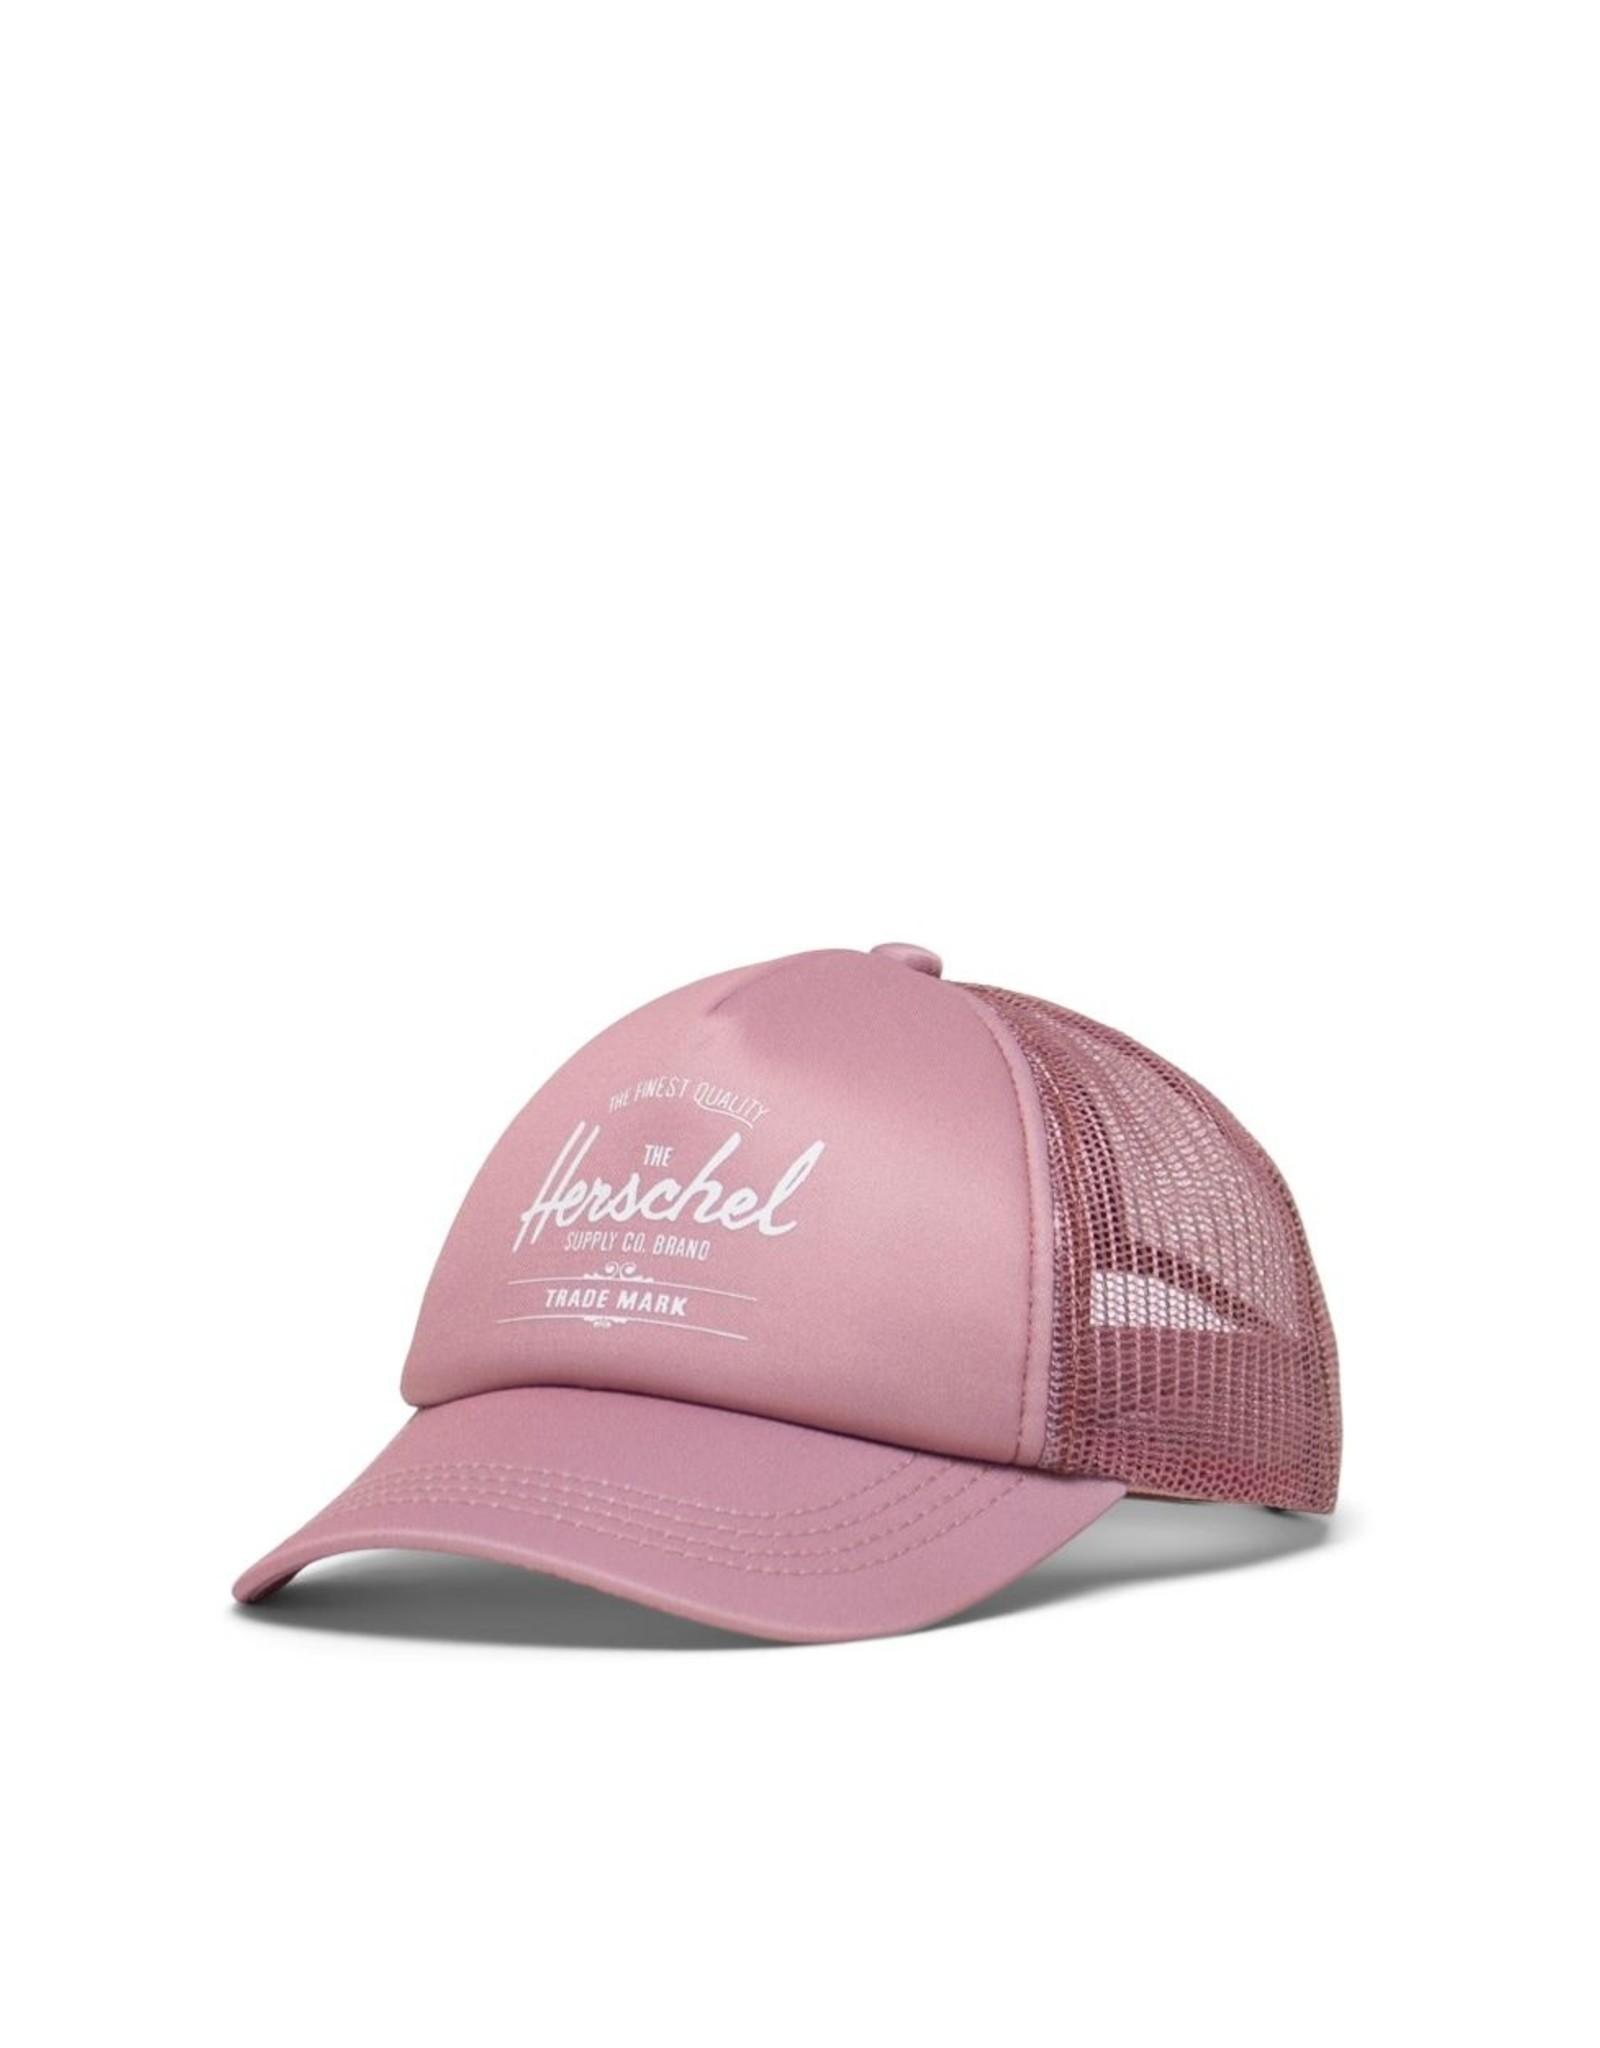 Herschel Supply Co. SP21 Rose Toddler Whaler Cap 2-5Y